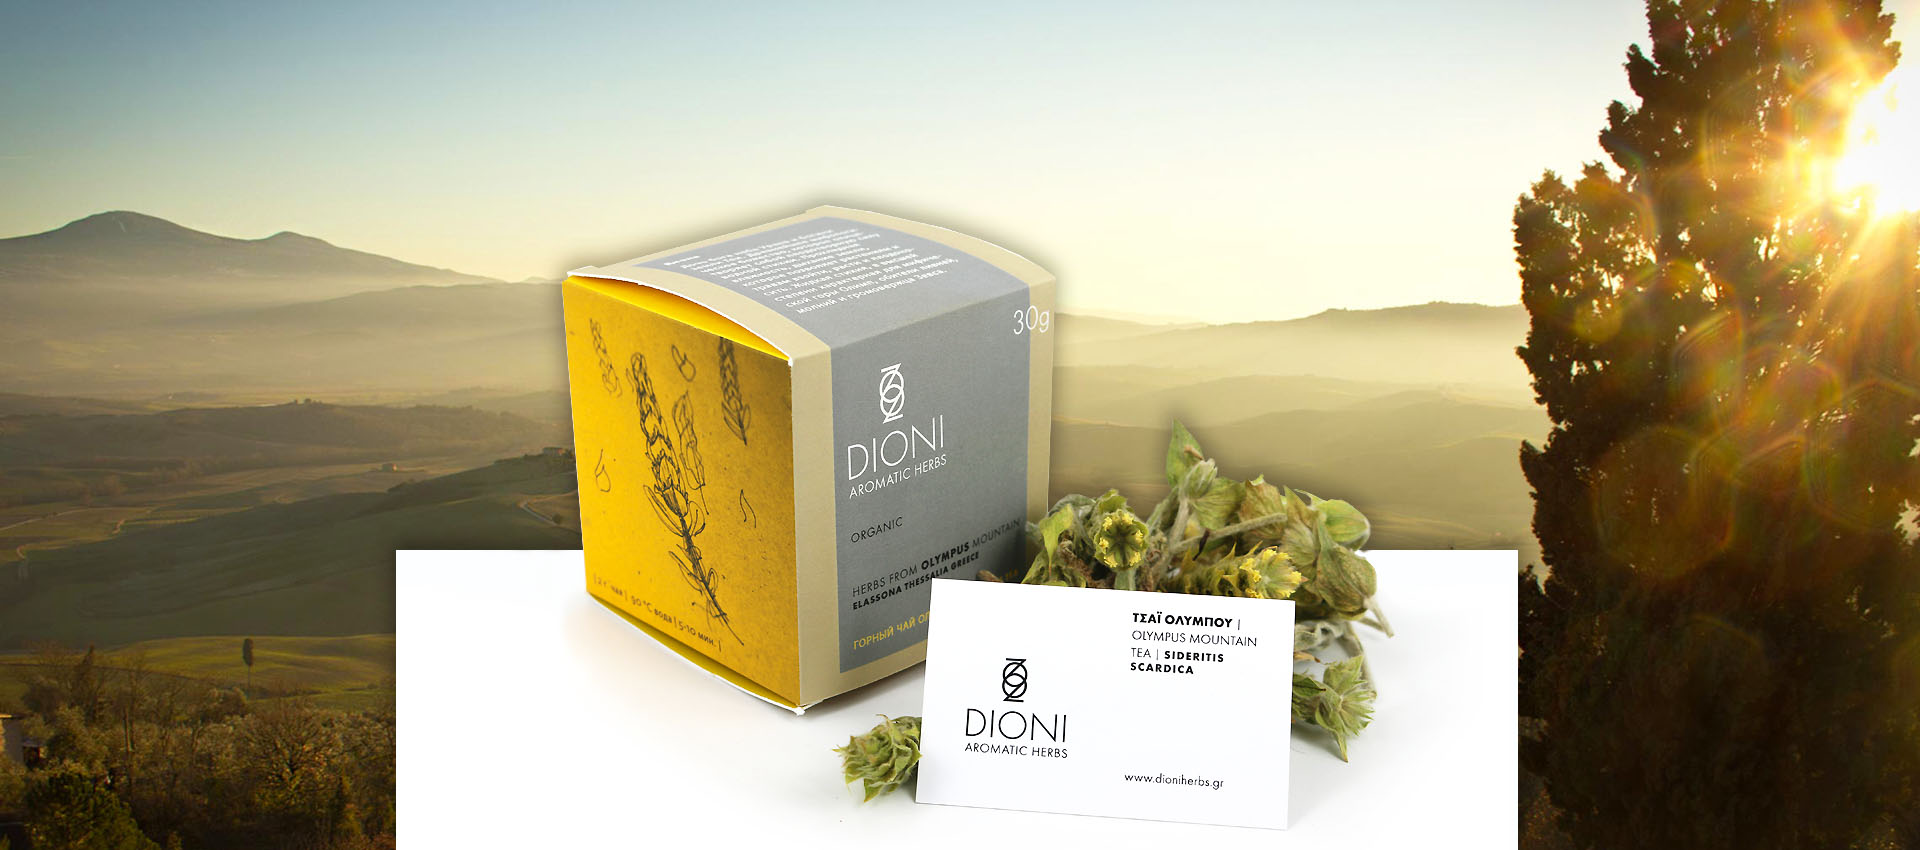 Dioni Olympus tea